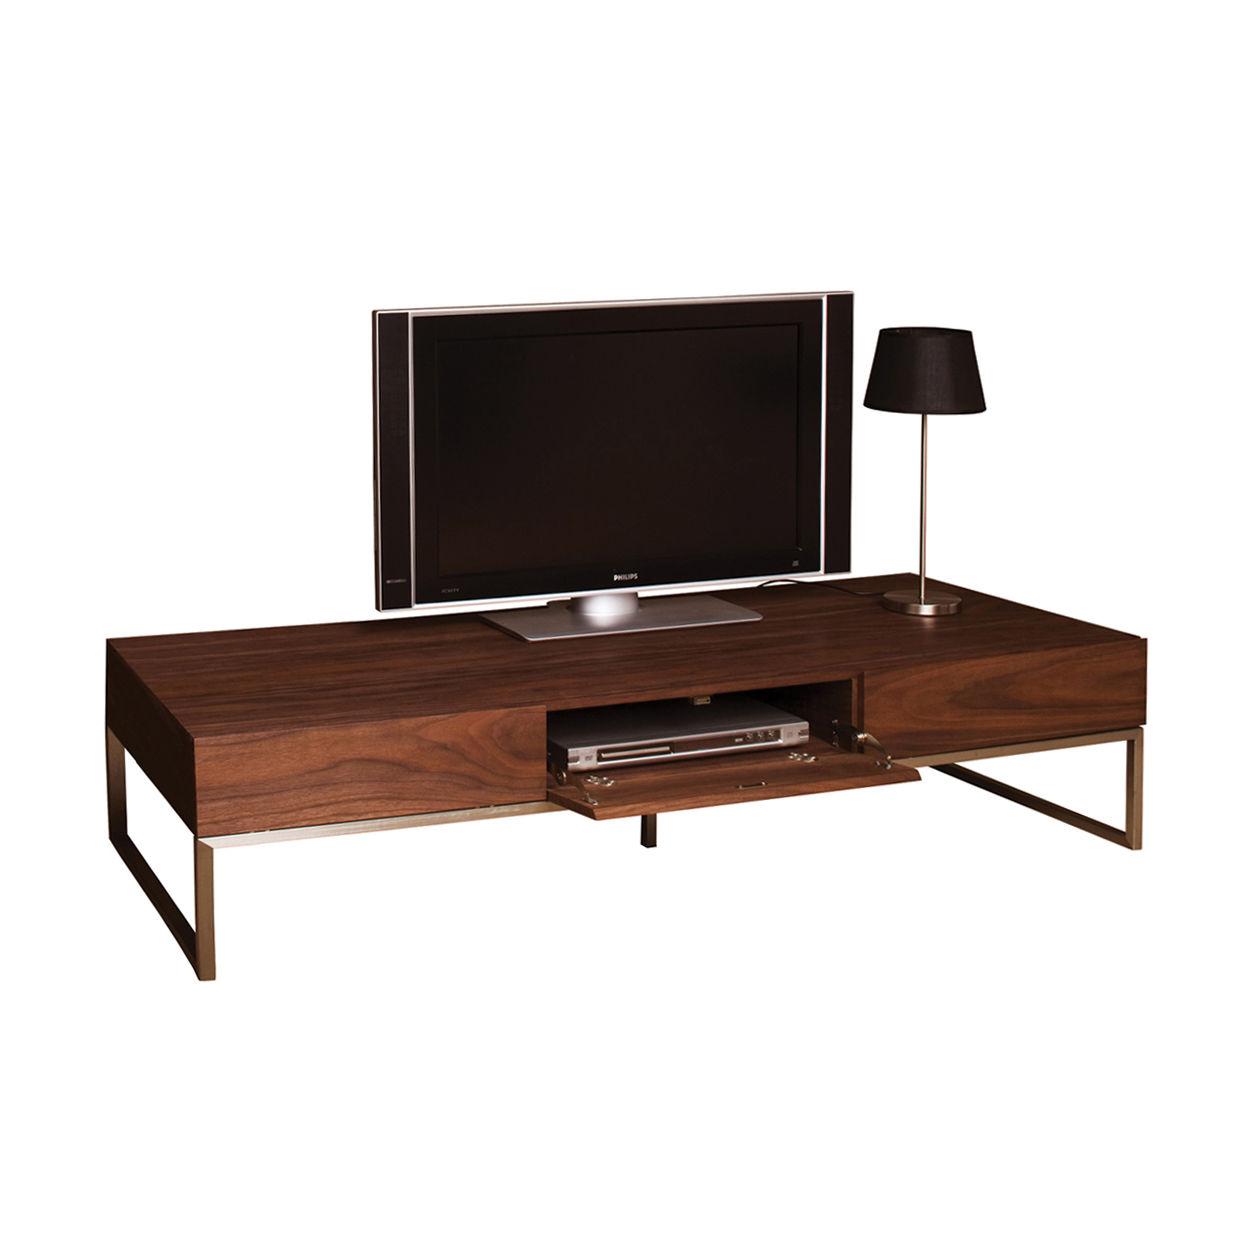 Keulen 24 TV meubel FBM